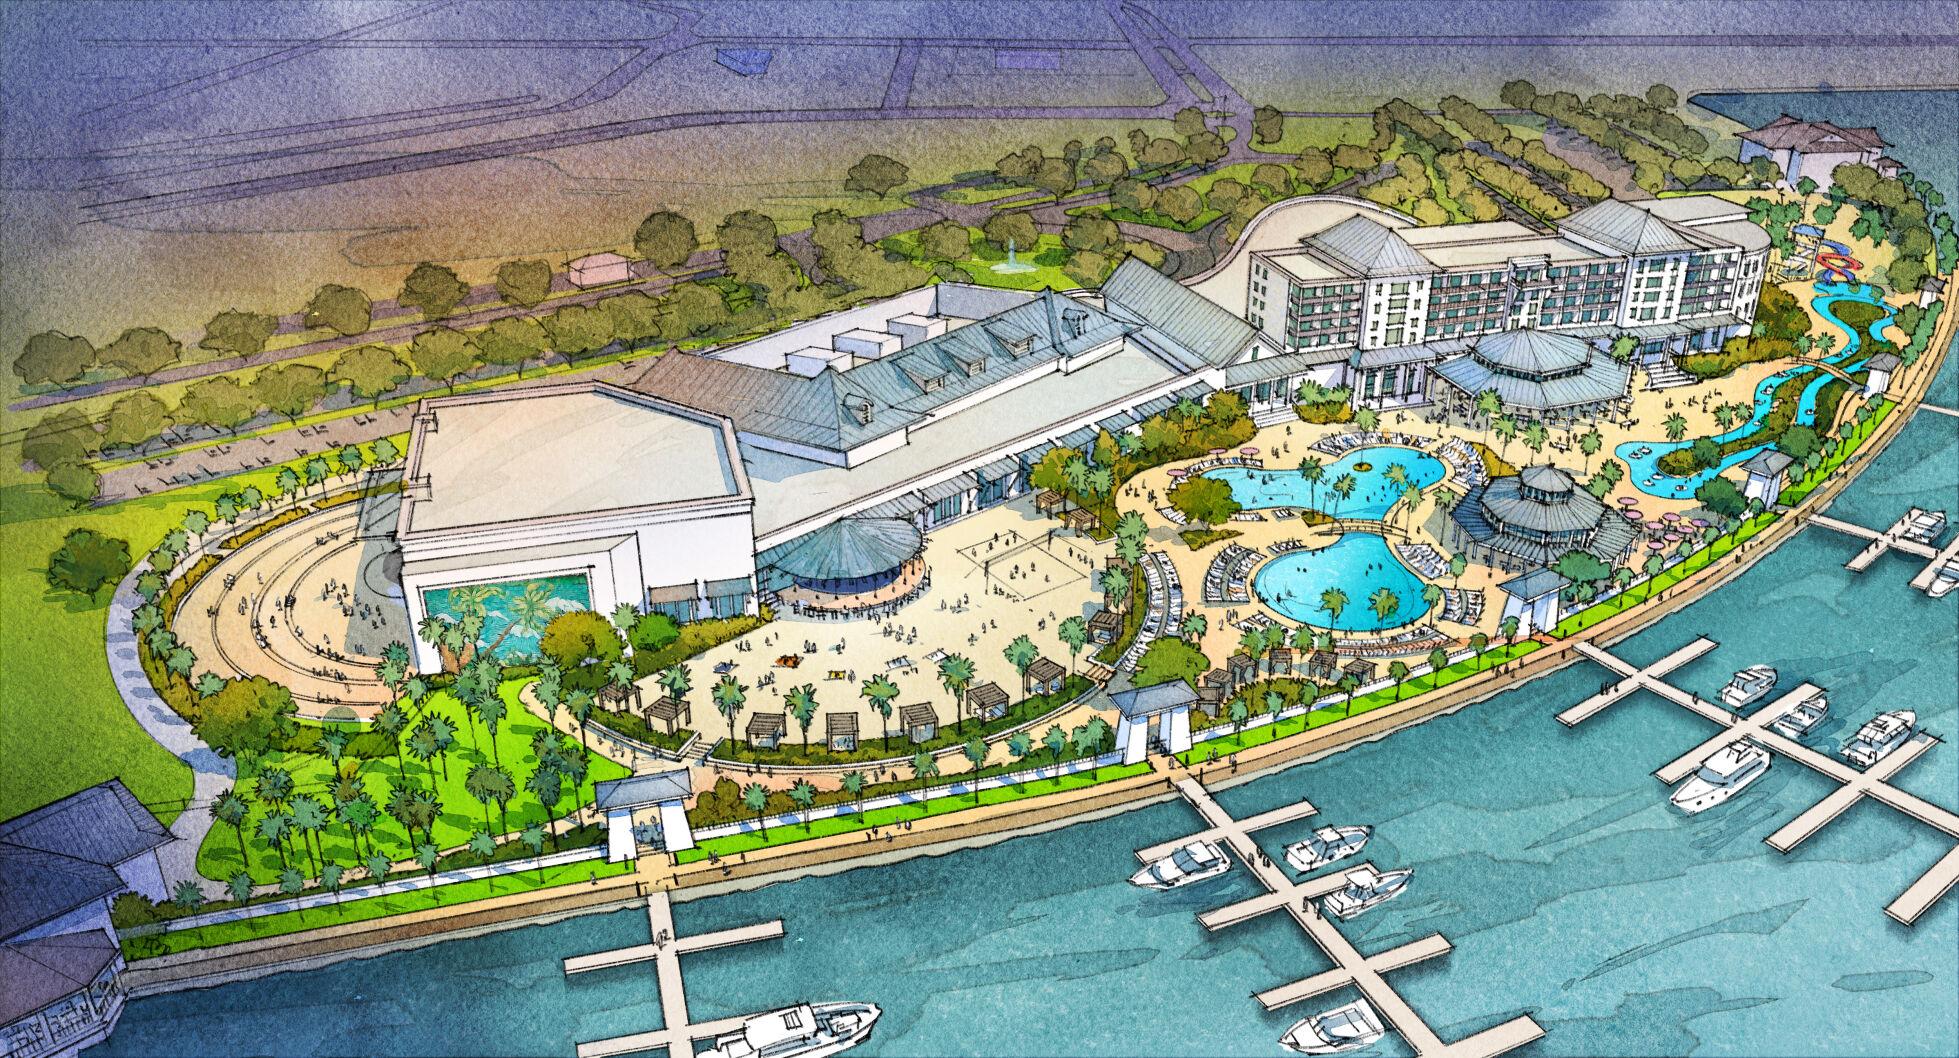 A $325 million casino is proposed in the Oak Harbor area near Slidell.